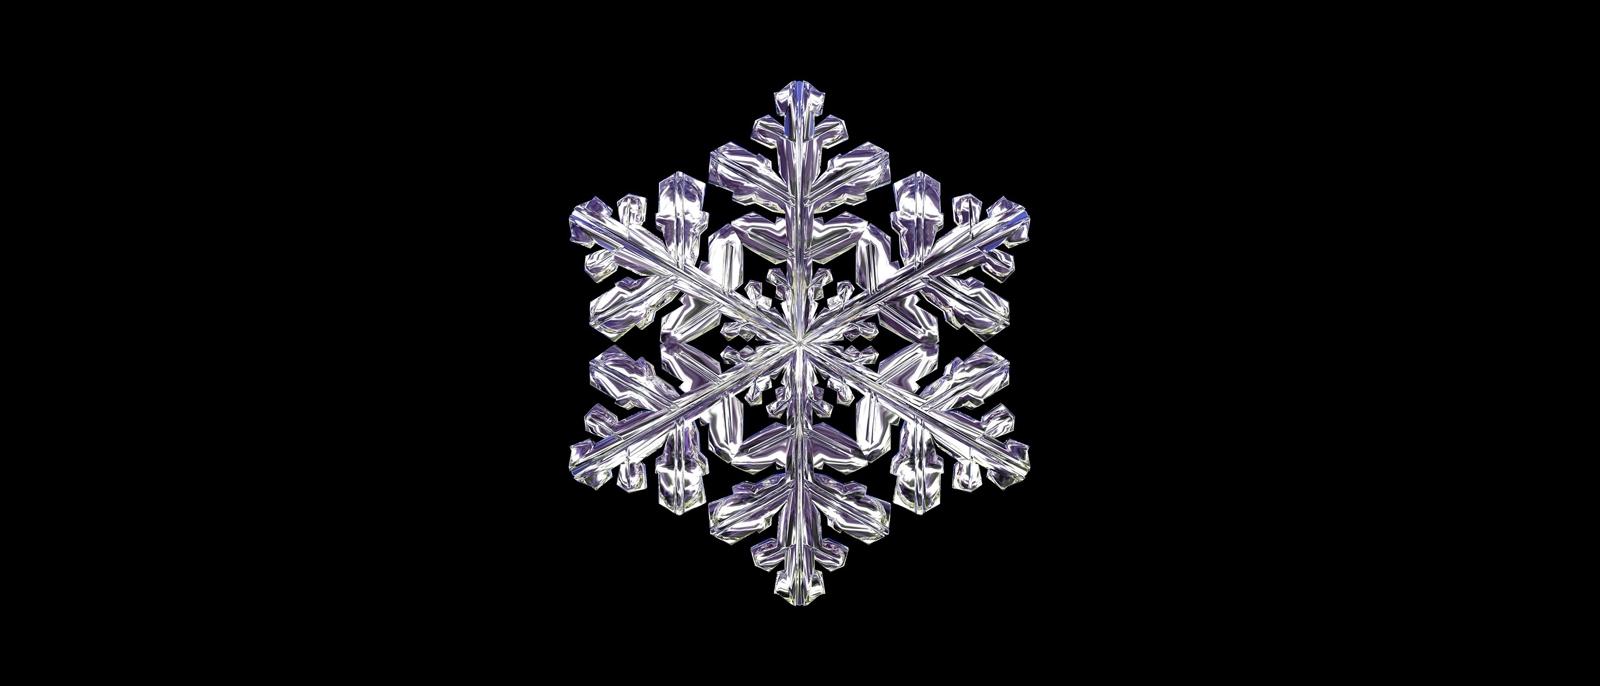 snowflakes symbols of individual